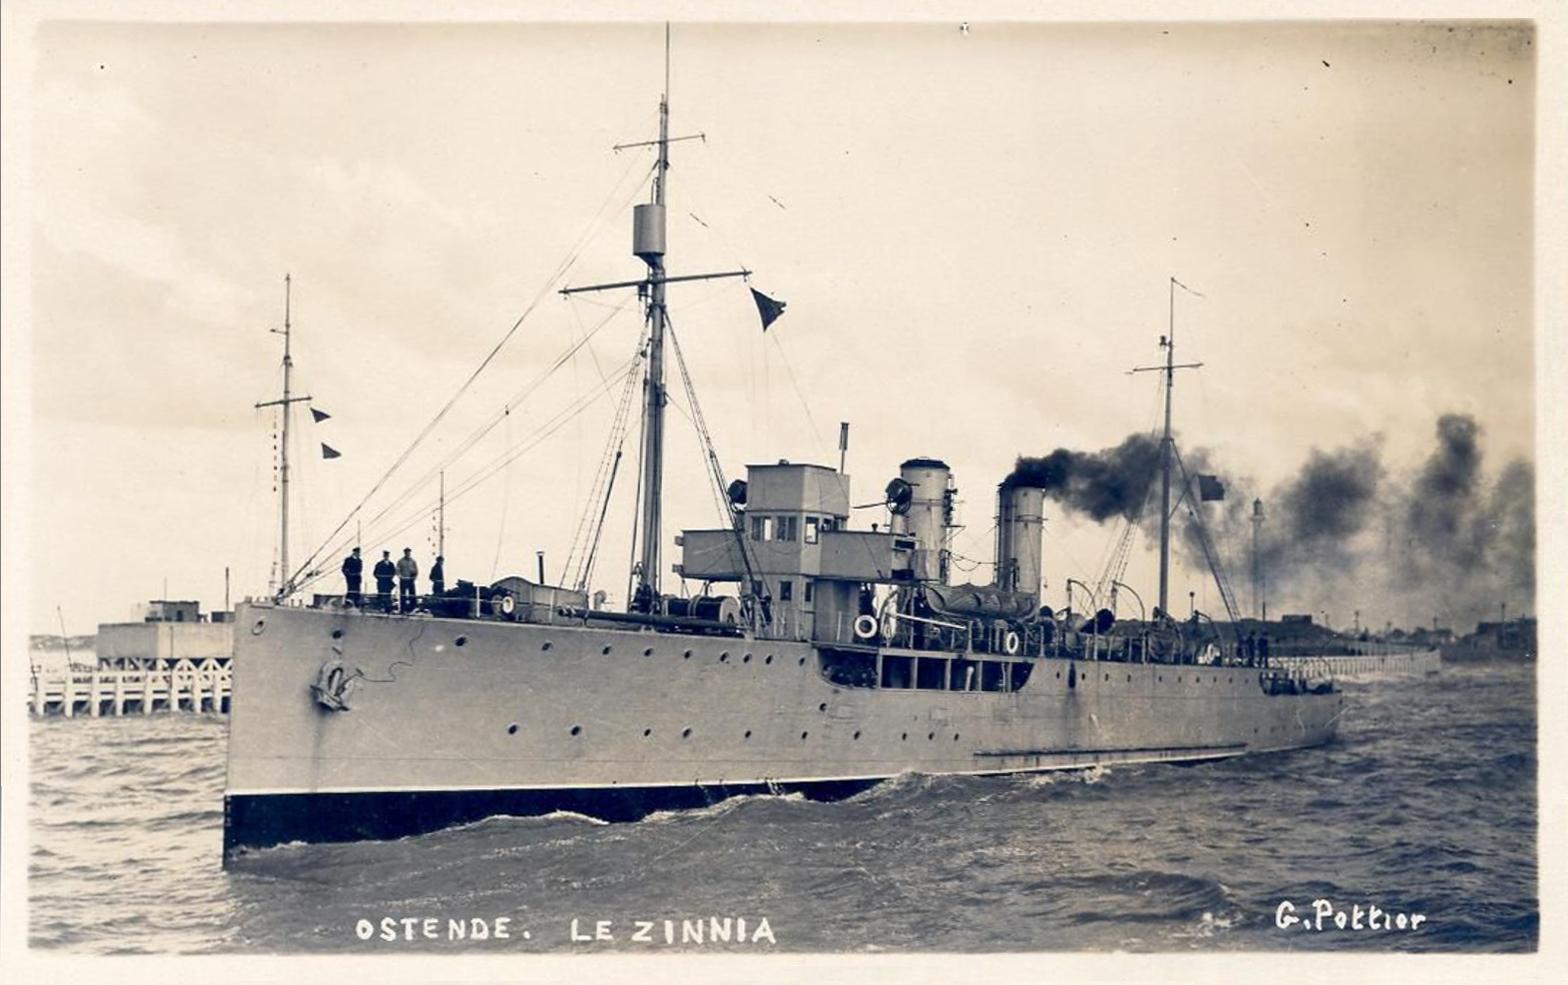 A la recherche de l'histoire du Zinnia - Page 13 Zinnia12